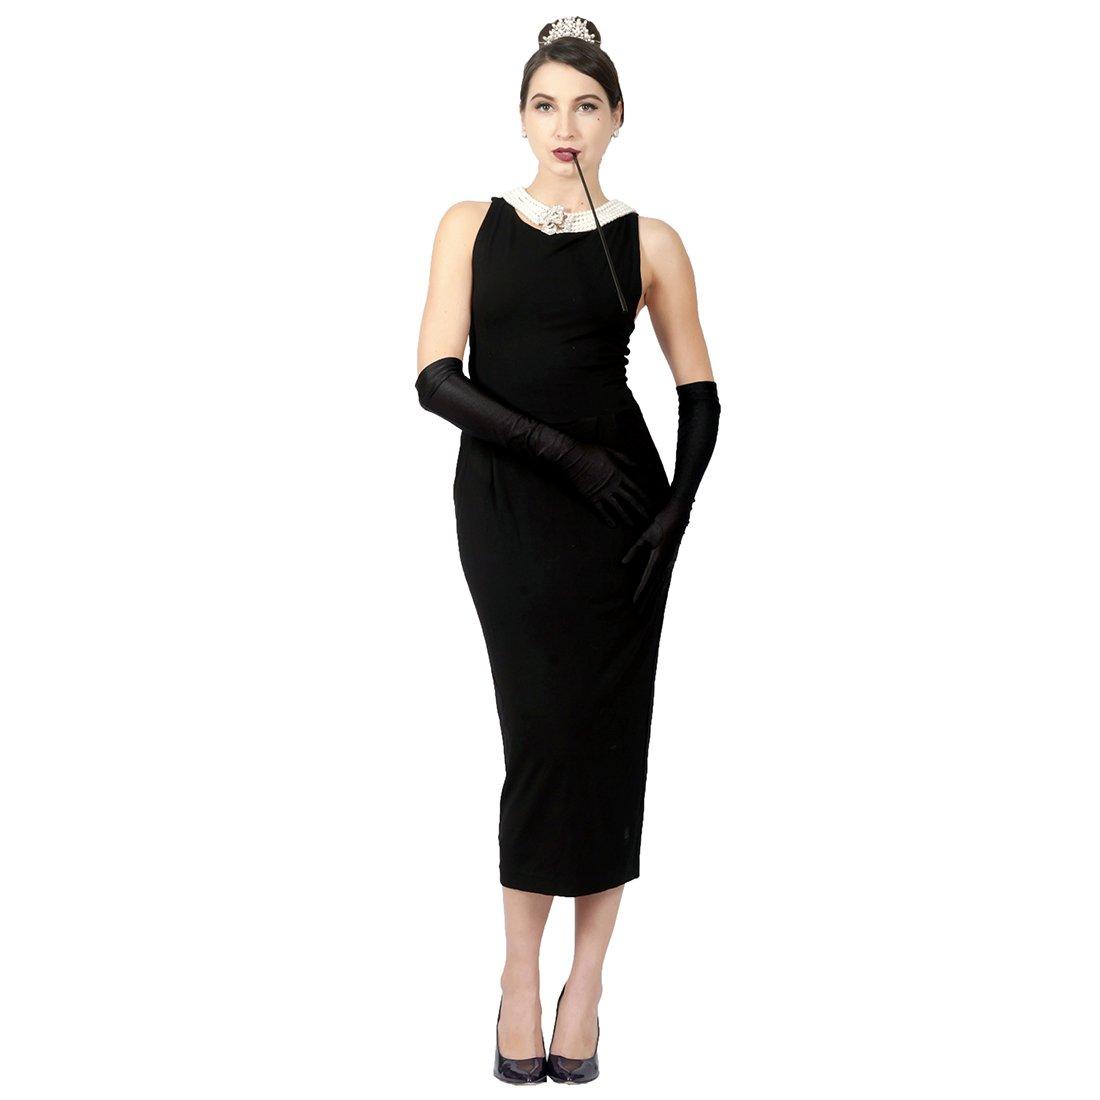 Celebrity Dresses Replica Uk - raveitsafe